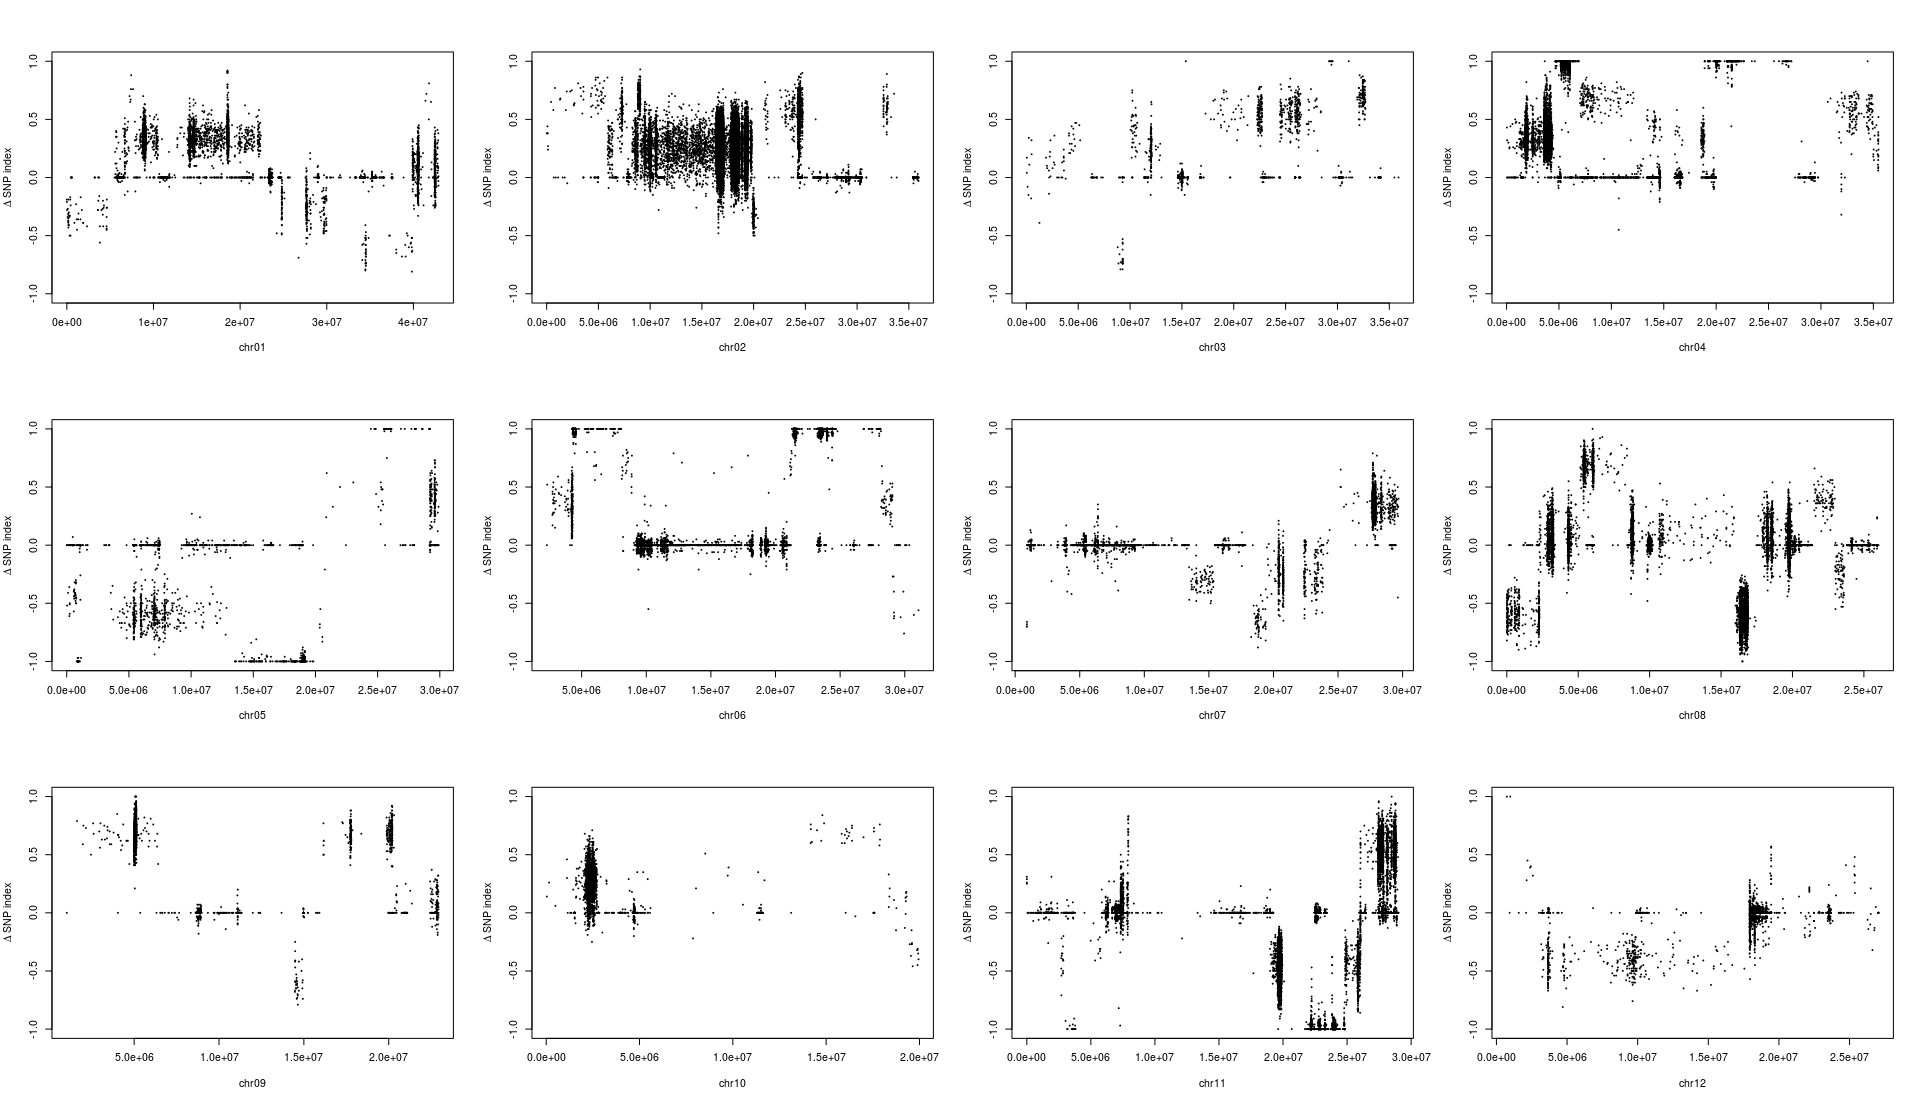 snp index-2